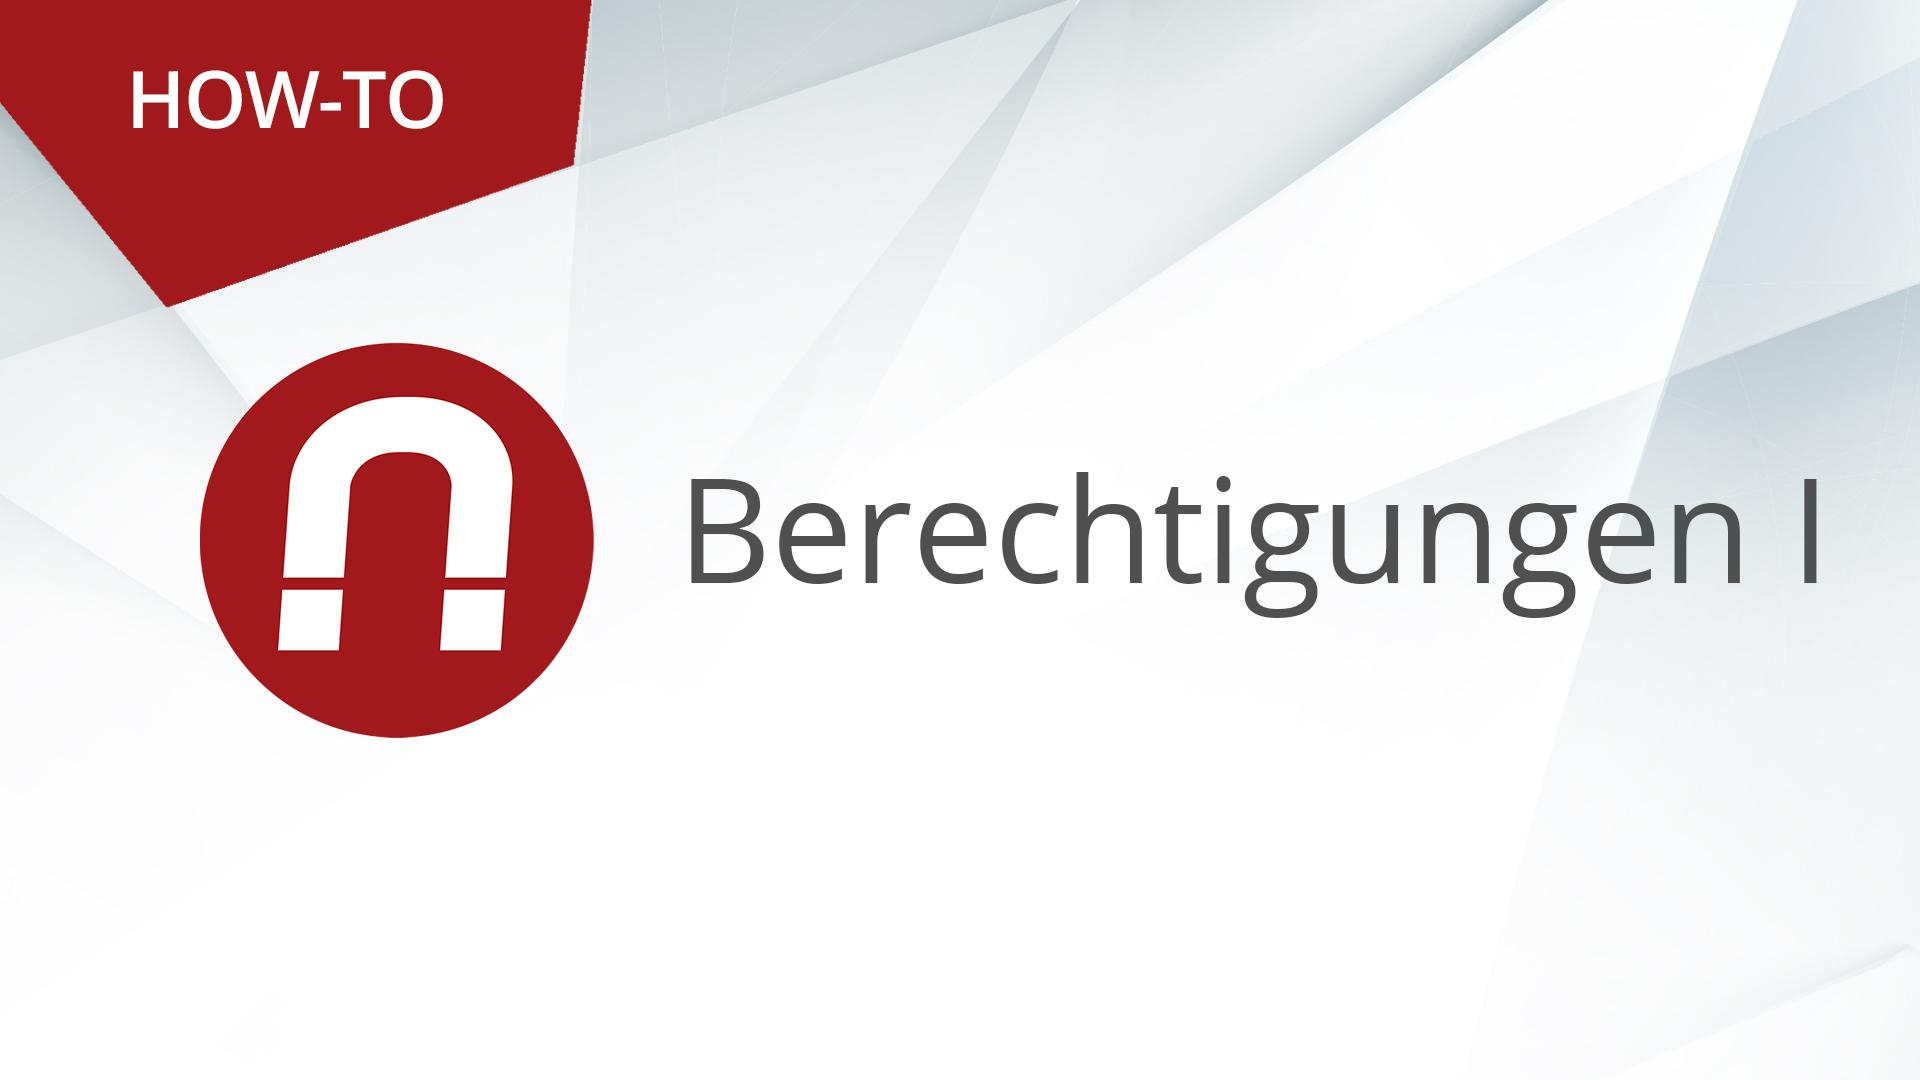 How-To: AMAGNO Advanced – Berechtigungen (TEIL 1)